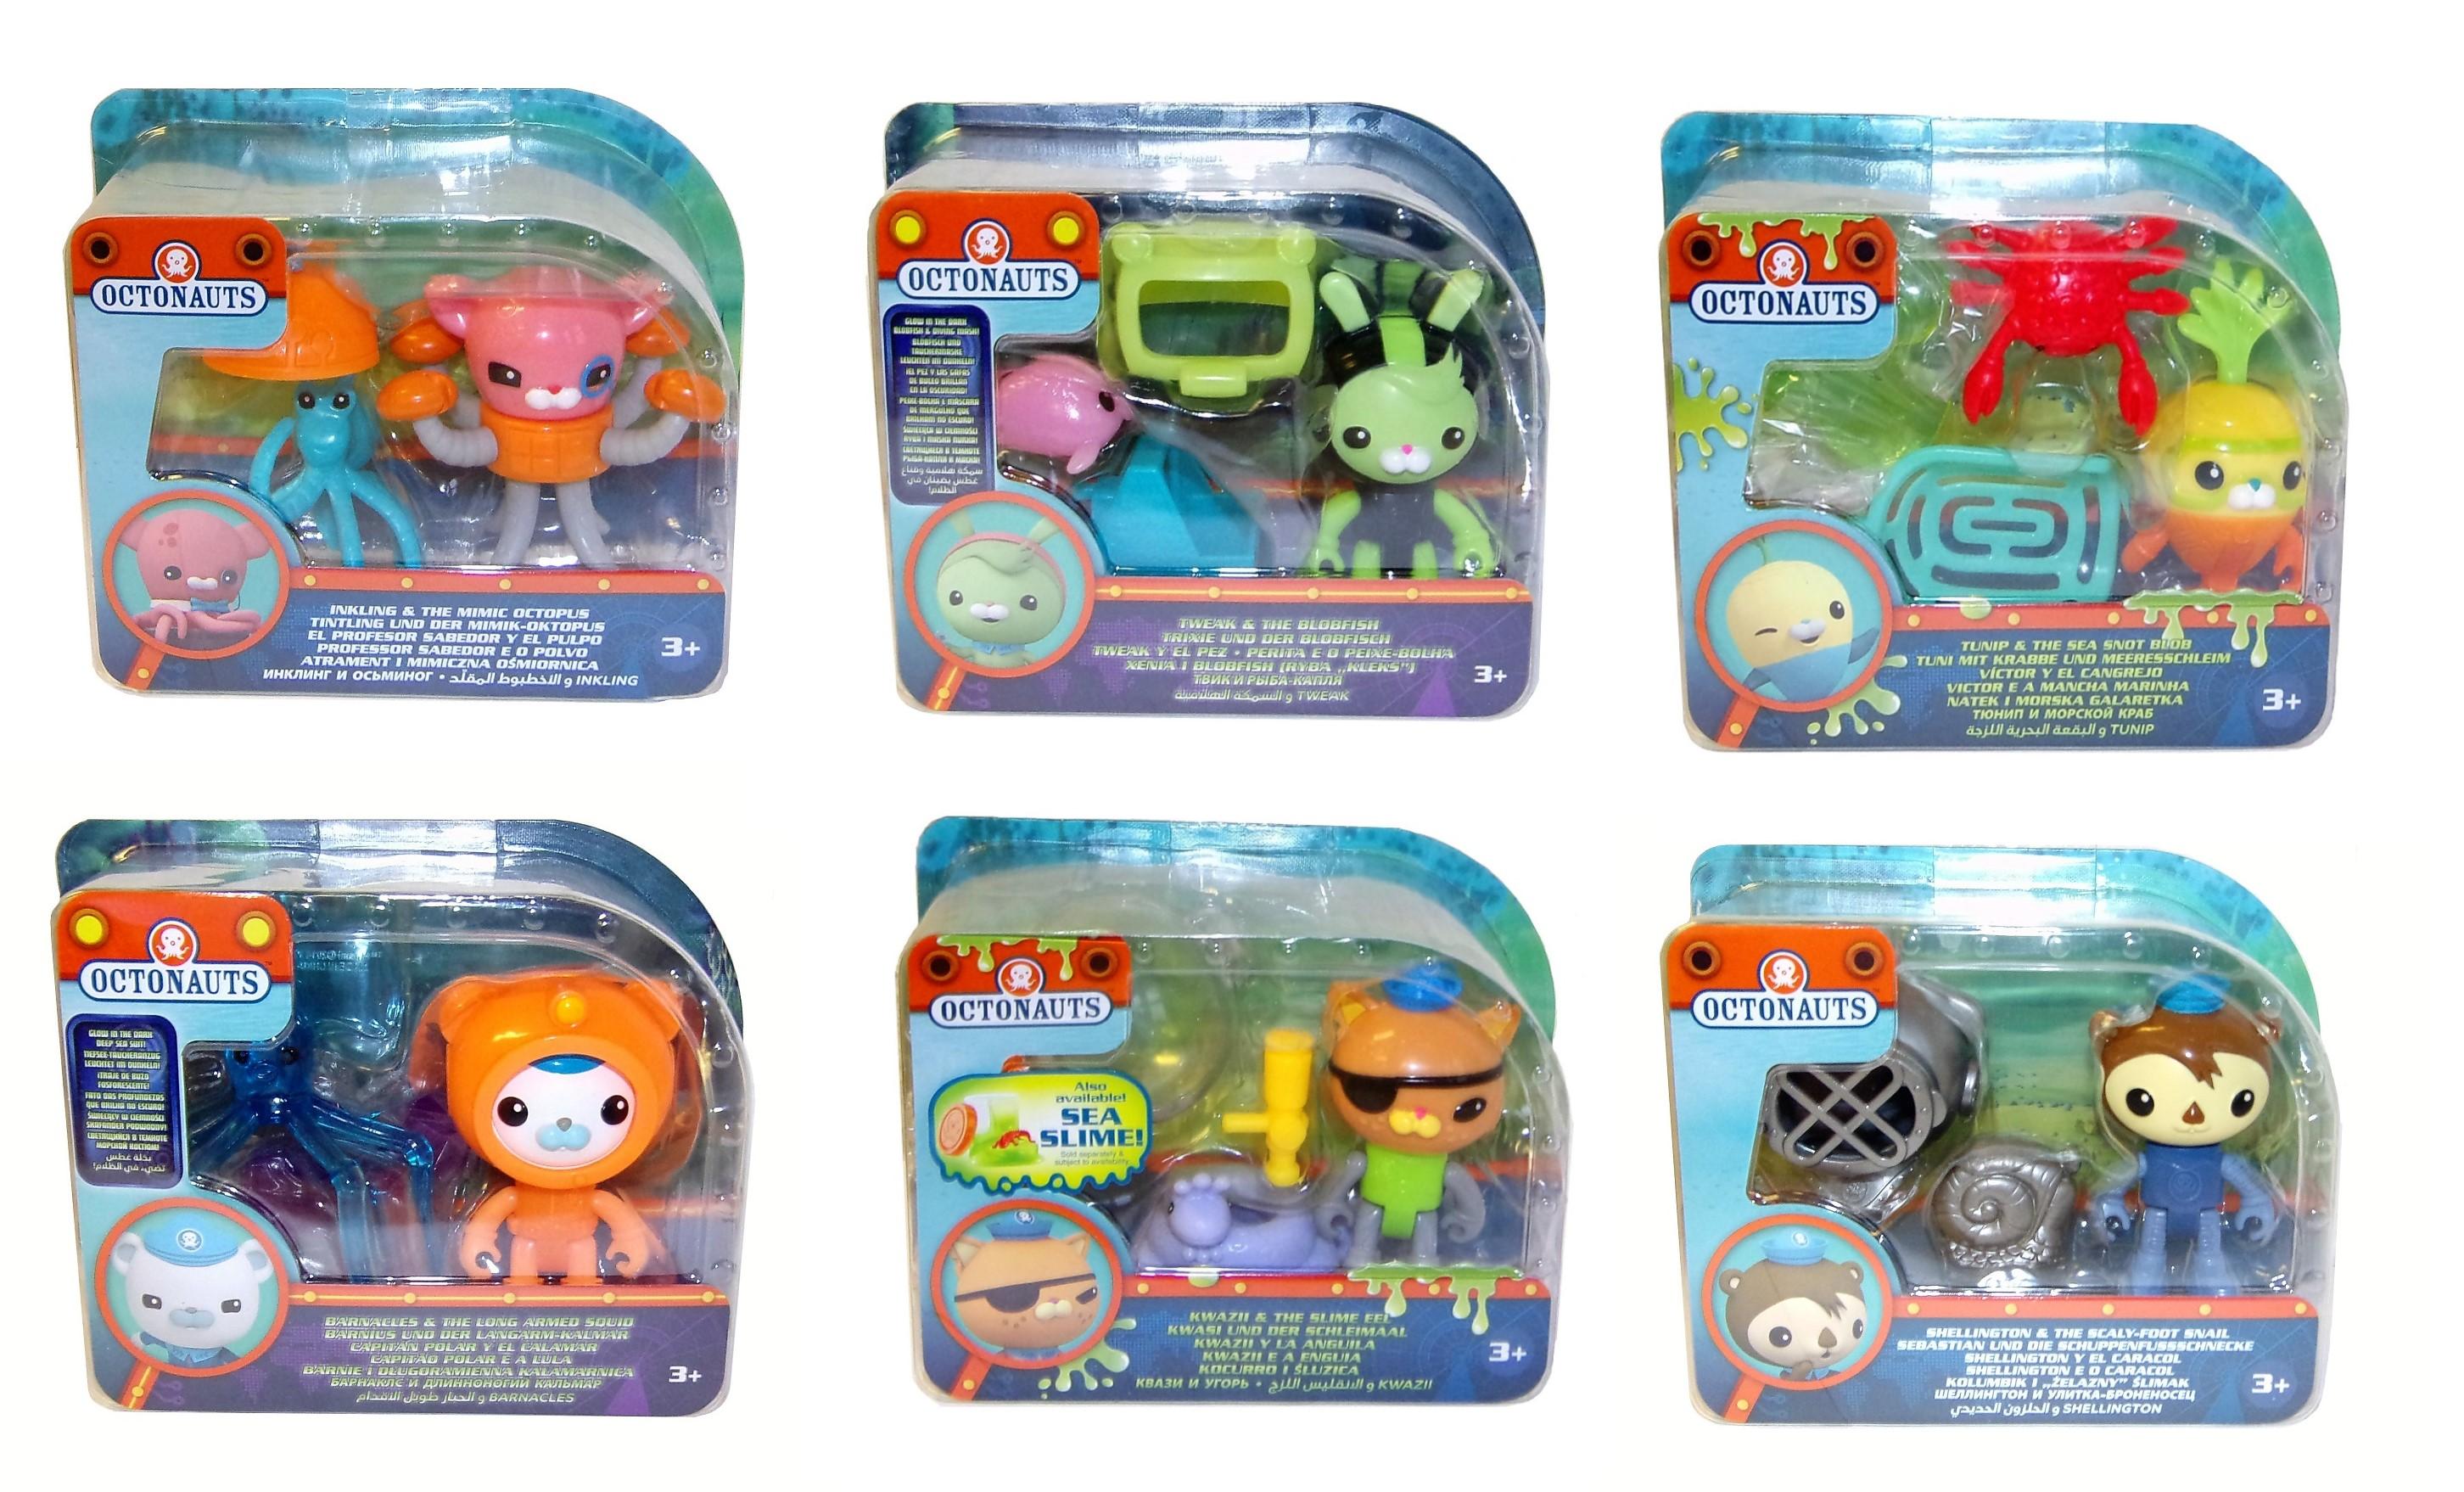 Fisher-Price Octonauts Spielset verschiedene Charaktere (Auswahl)